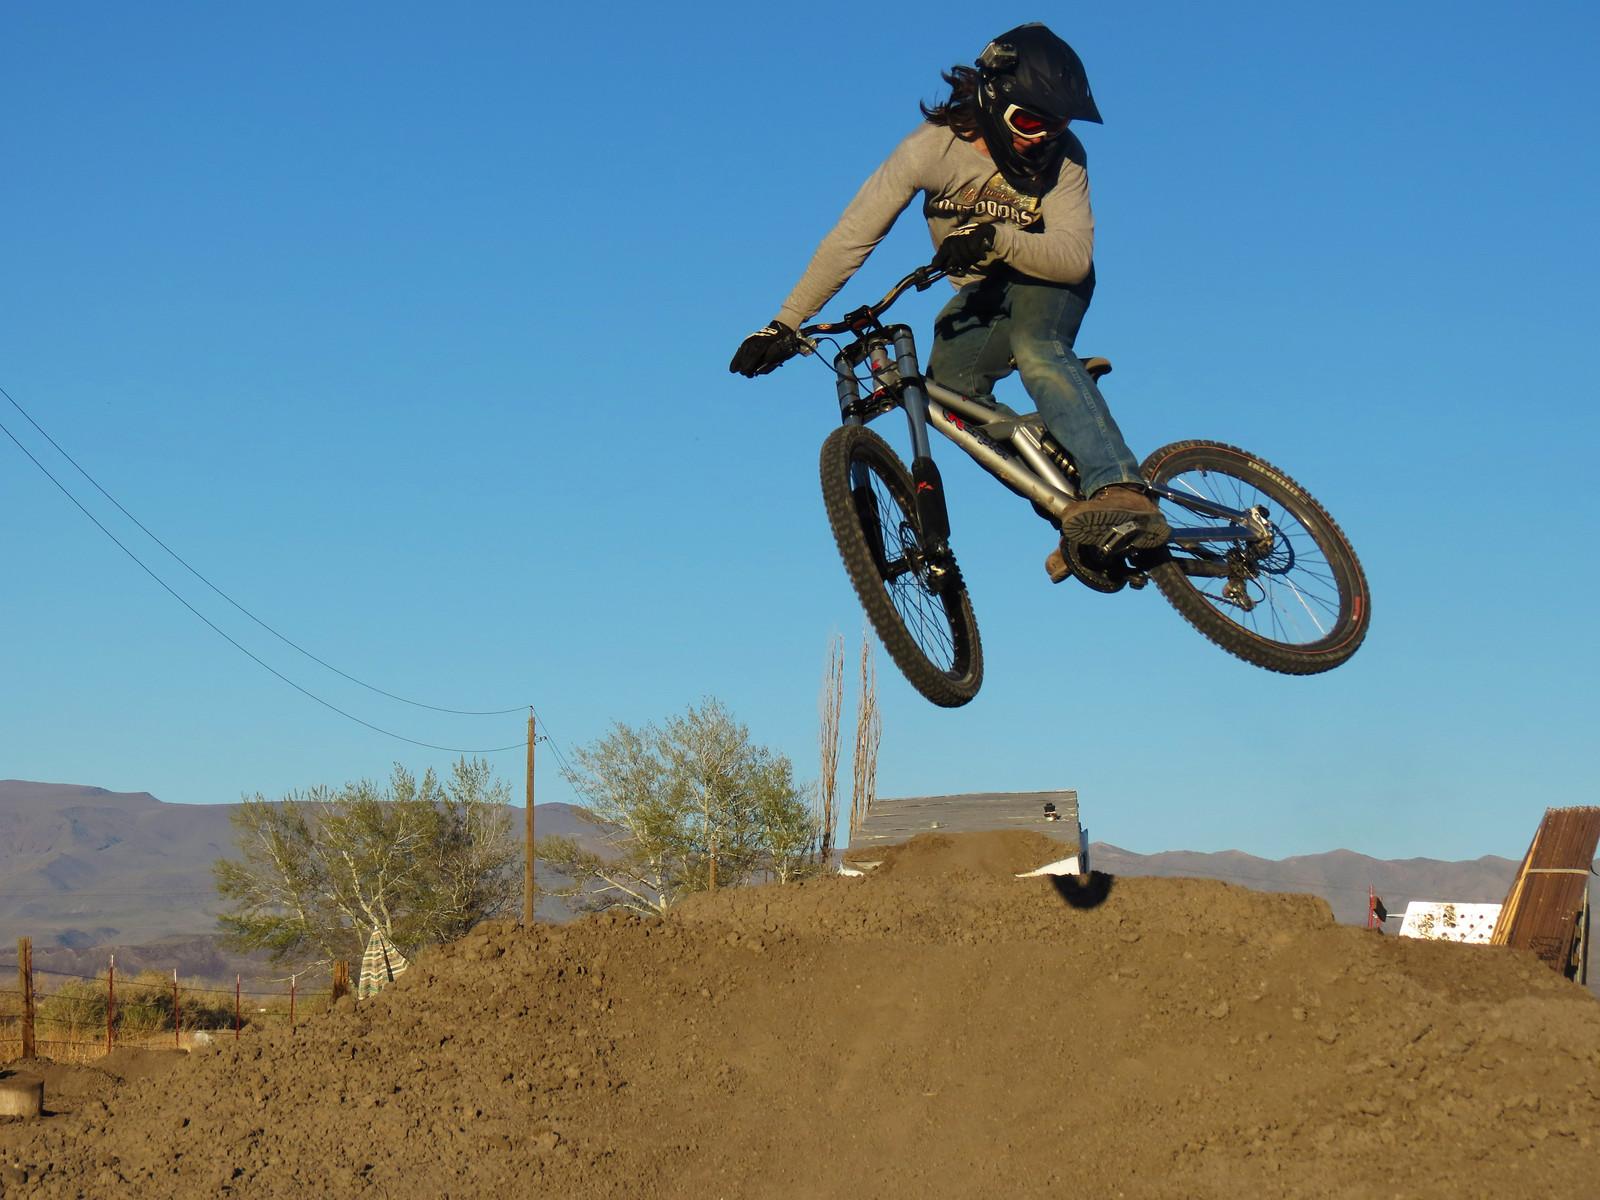 cim whipz 4 - Moosey - Mountain Biking Pictures - Vital MTB